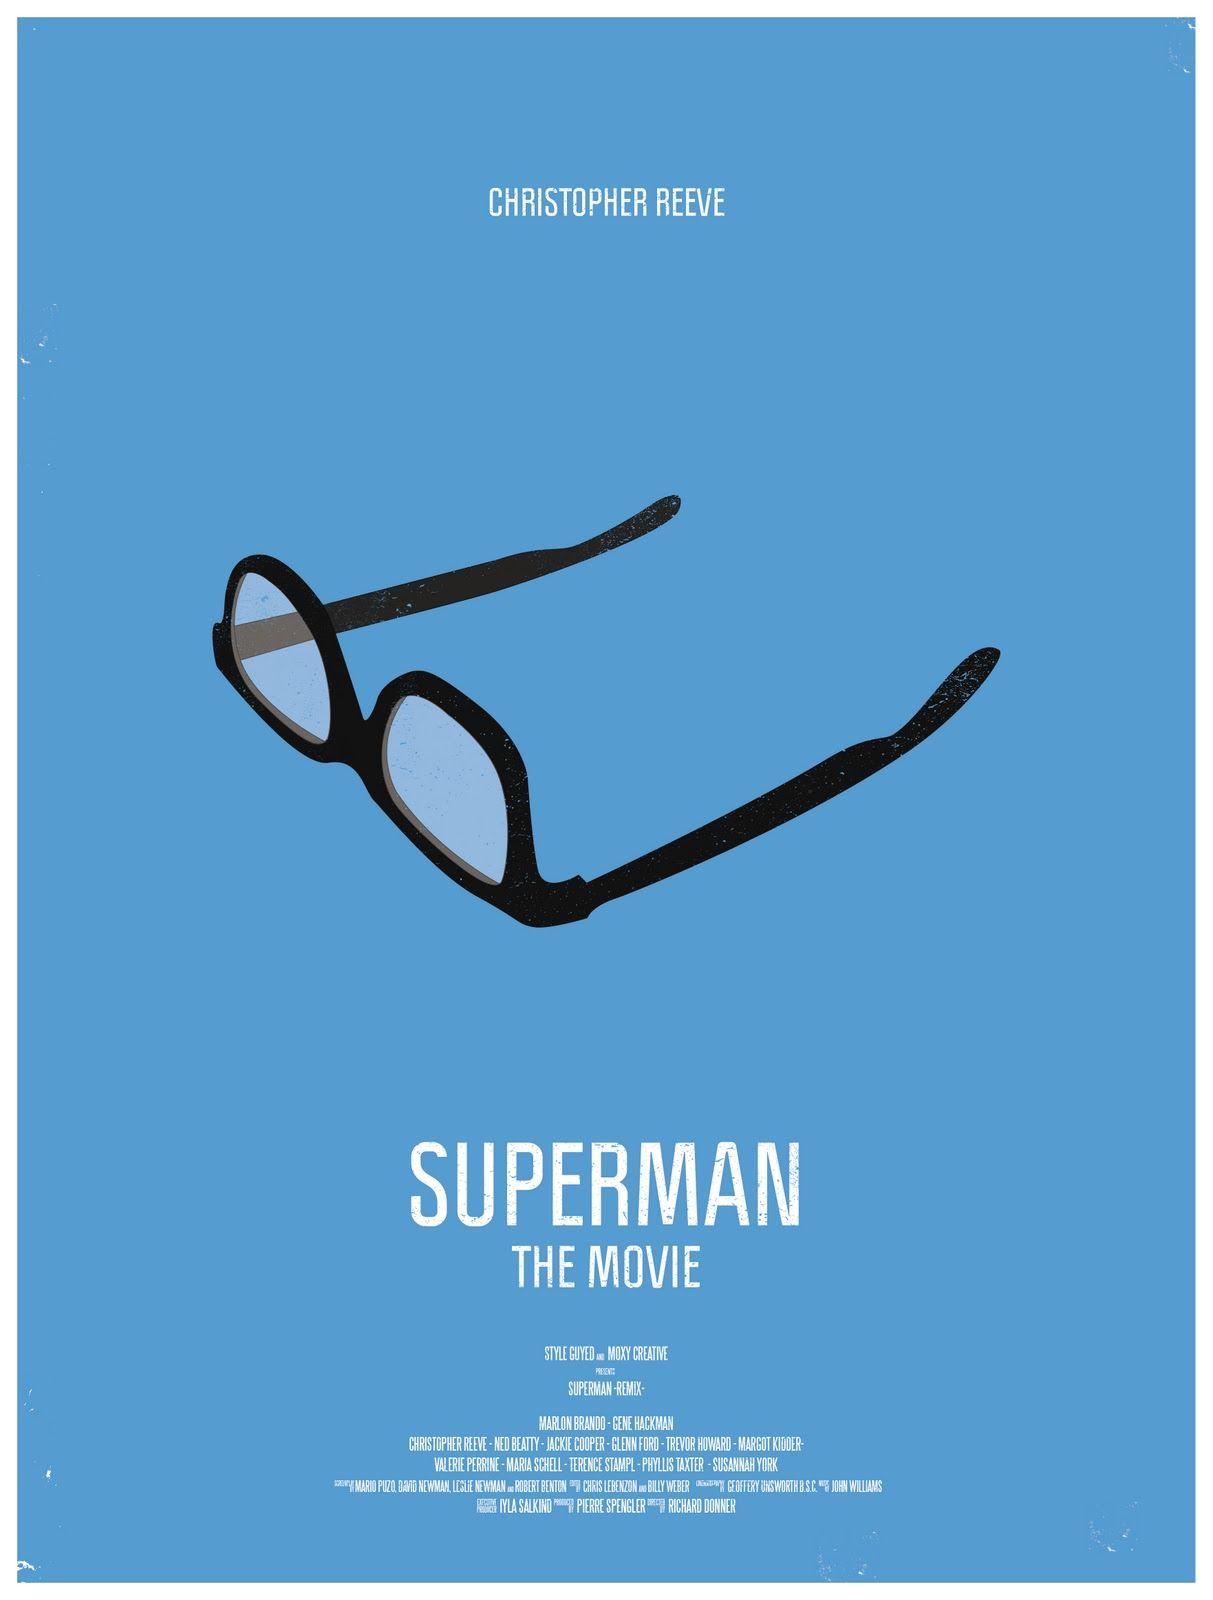 Redesigned movie poster   Inspiration   Pinterest   Movie, Film ...